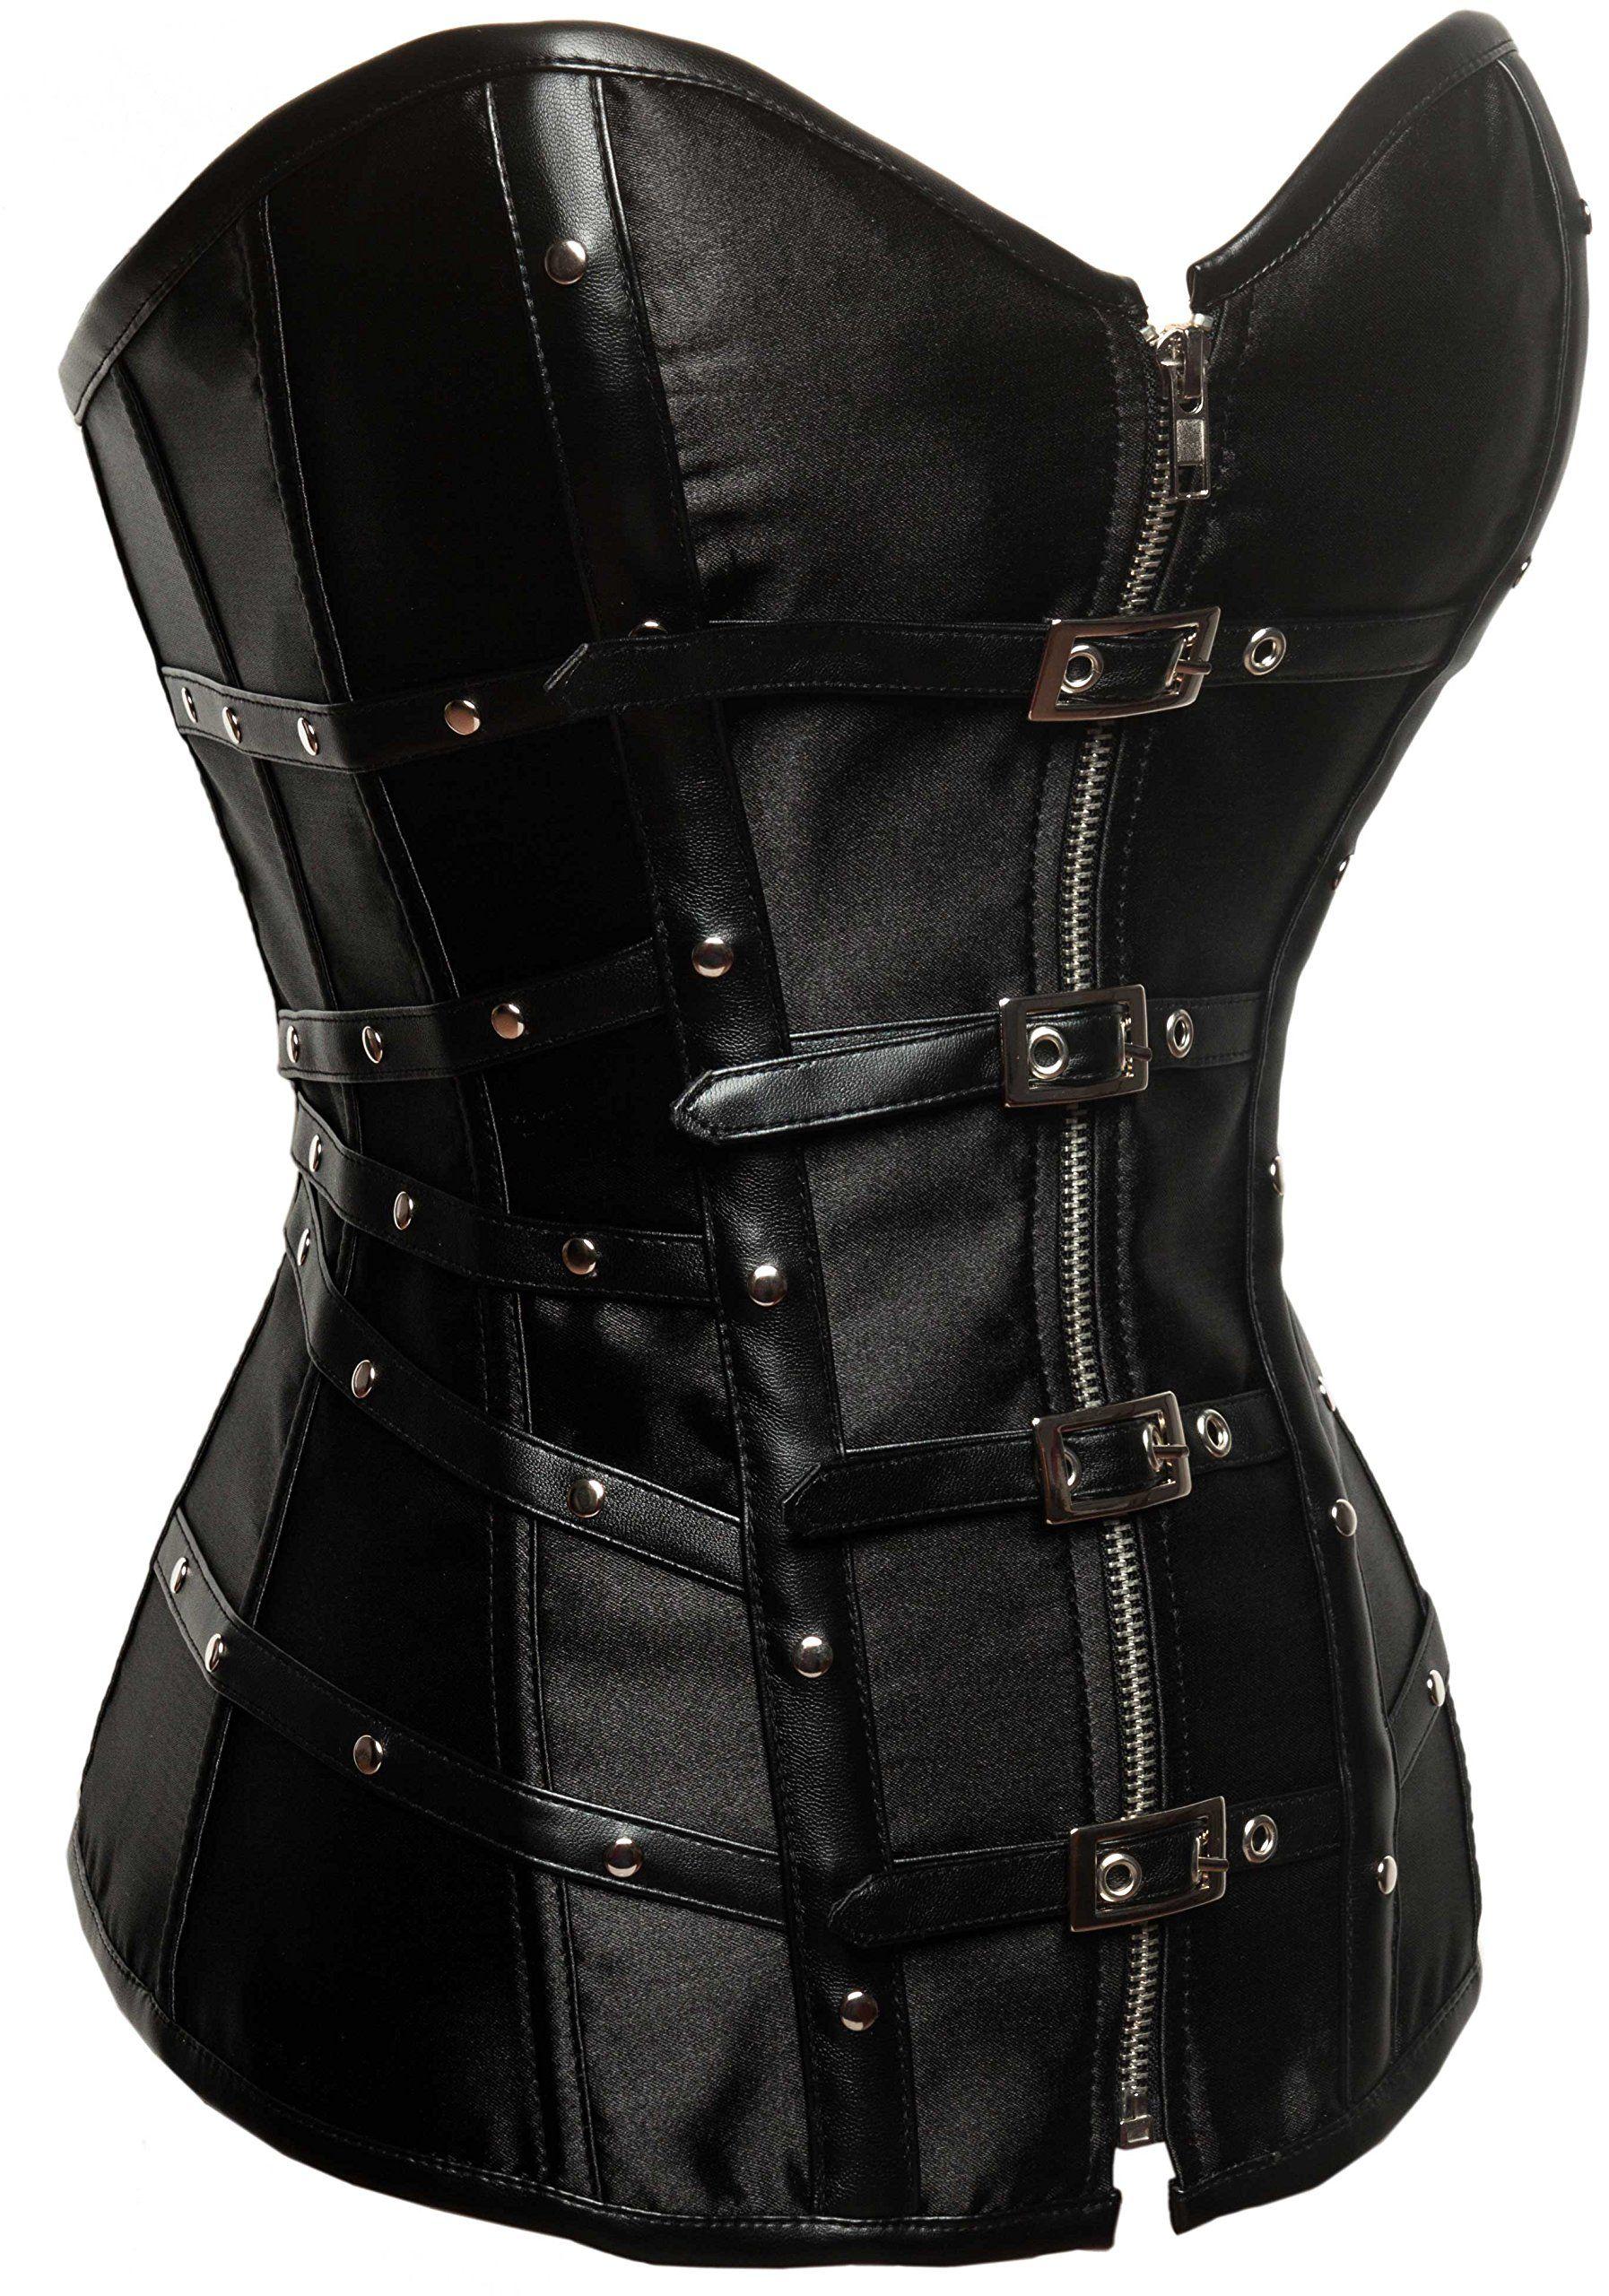 Charmian Lucea Womens Gothic Punk Steampunk Satin Lace Up Long Corset Dress